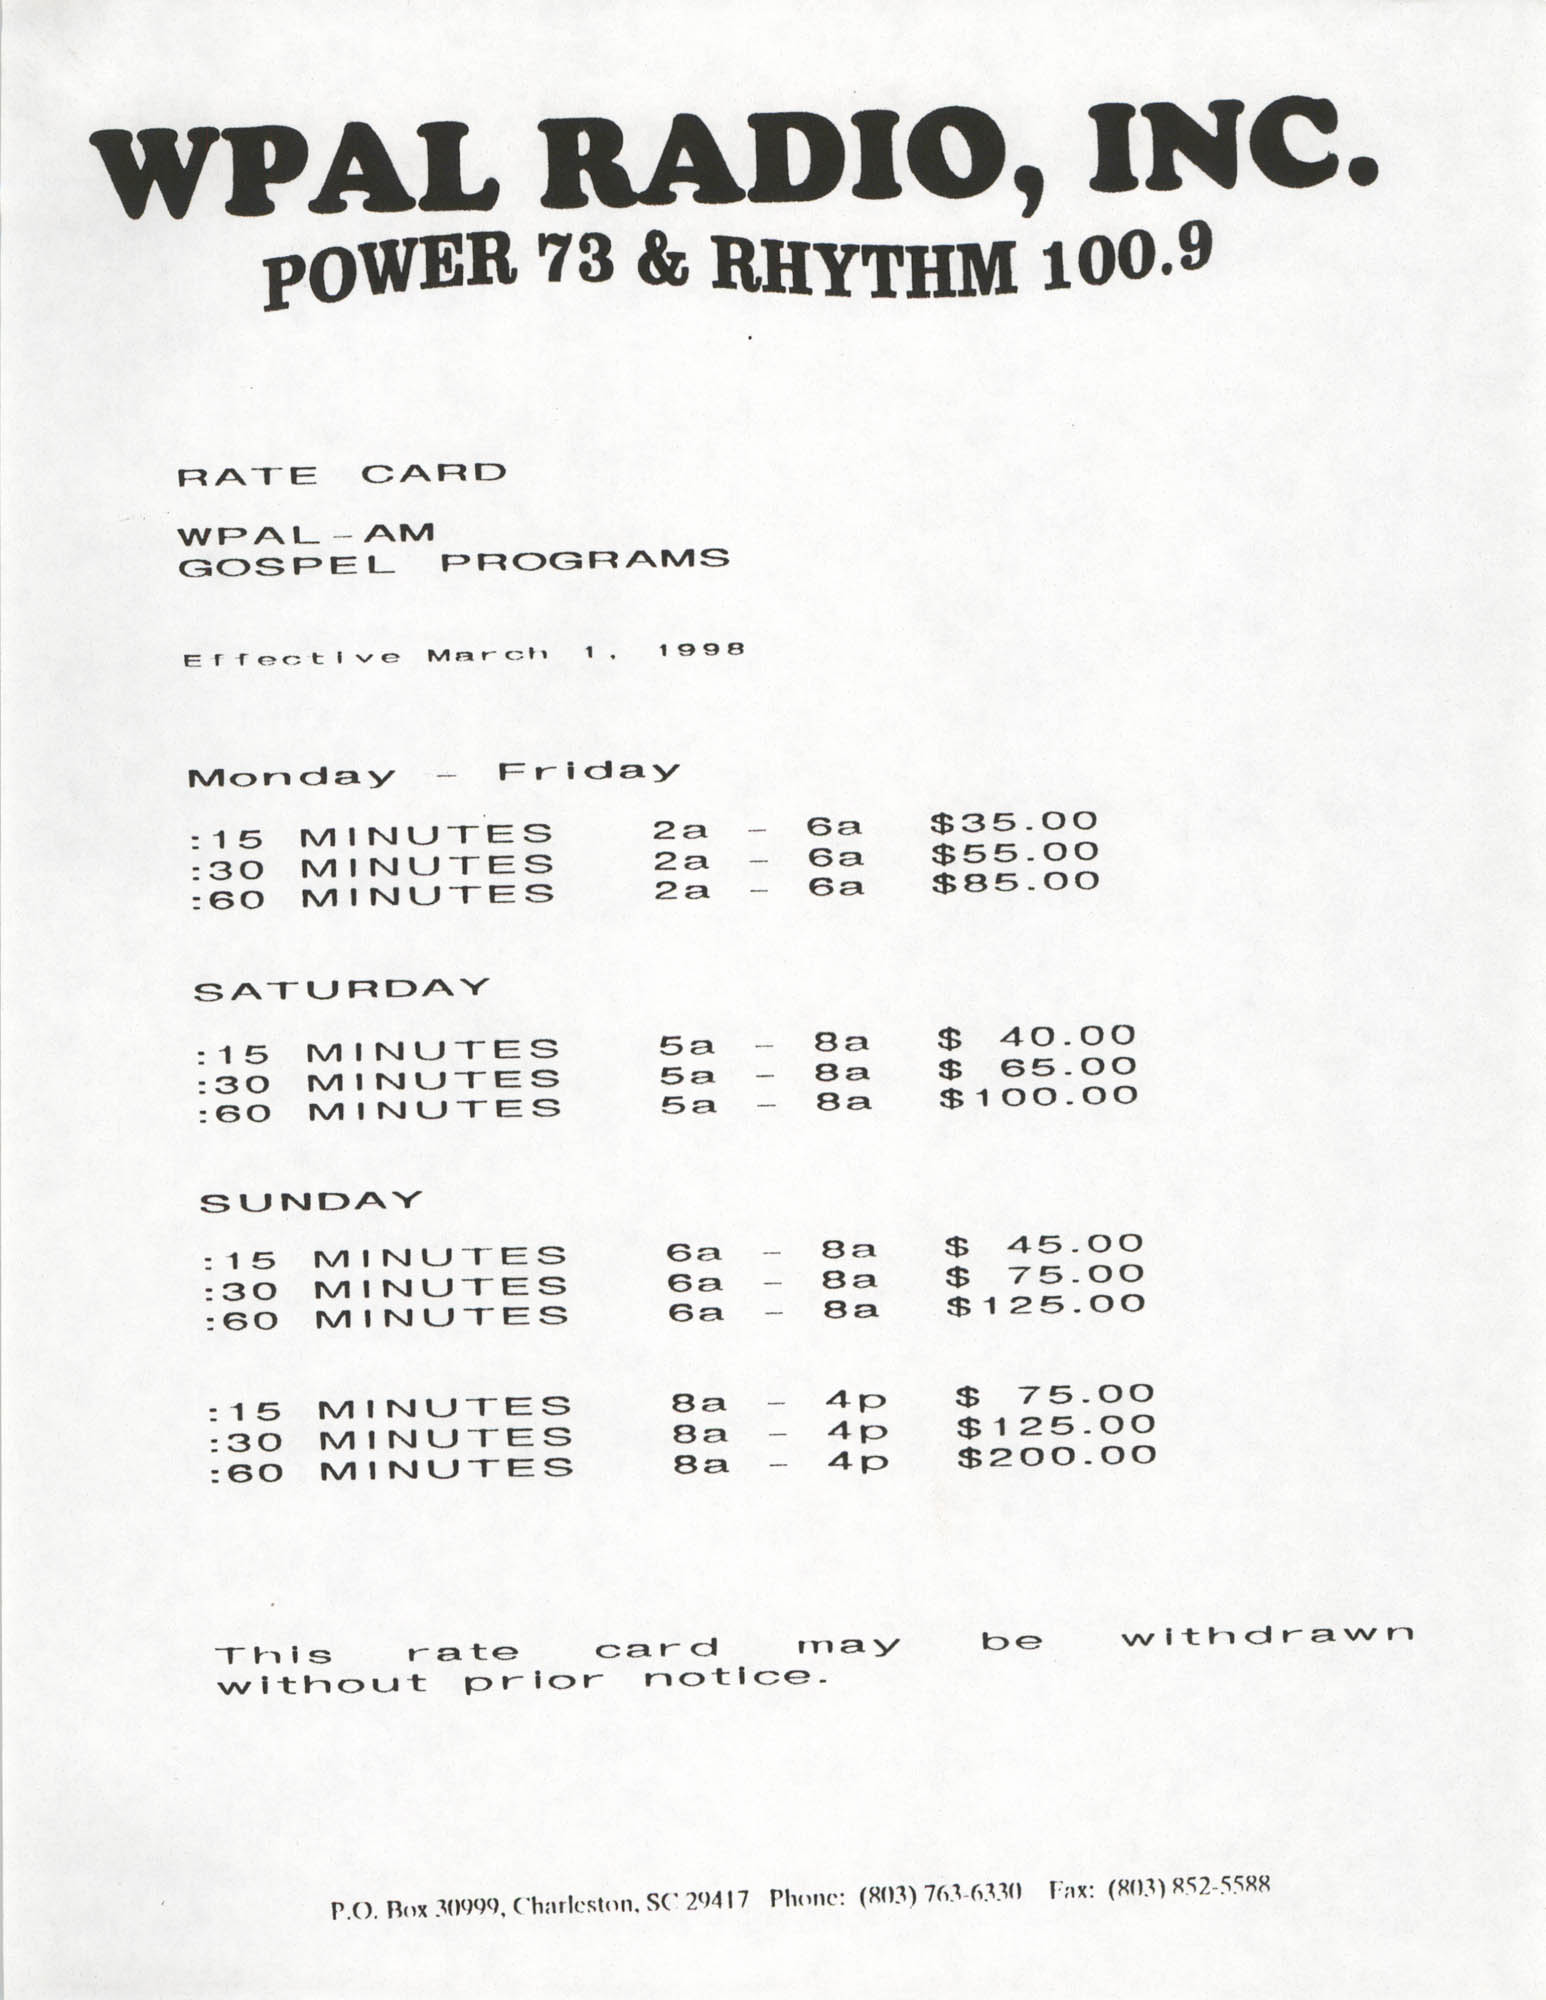 WPAL Radio, Inc. Memorandum, August 28, 1998